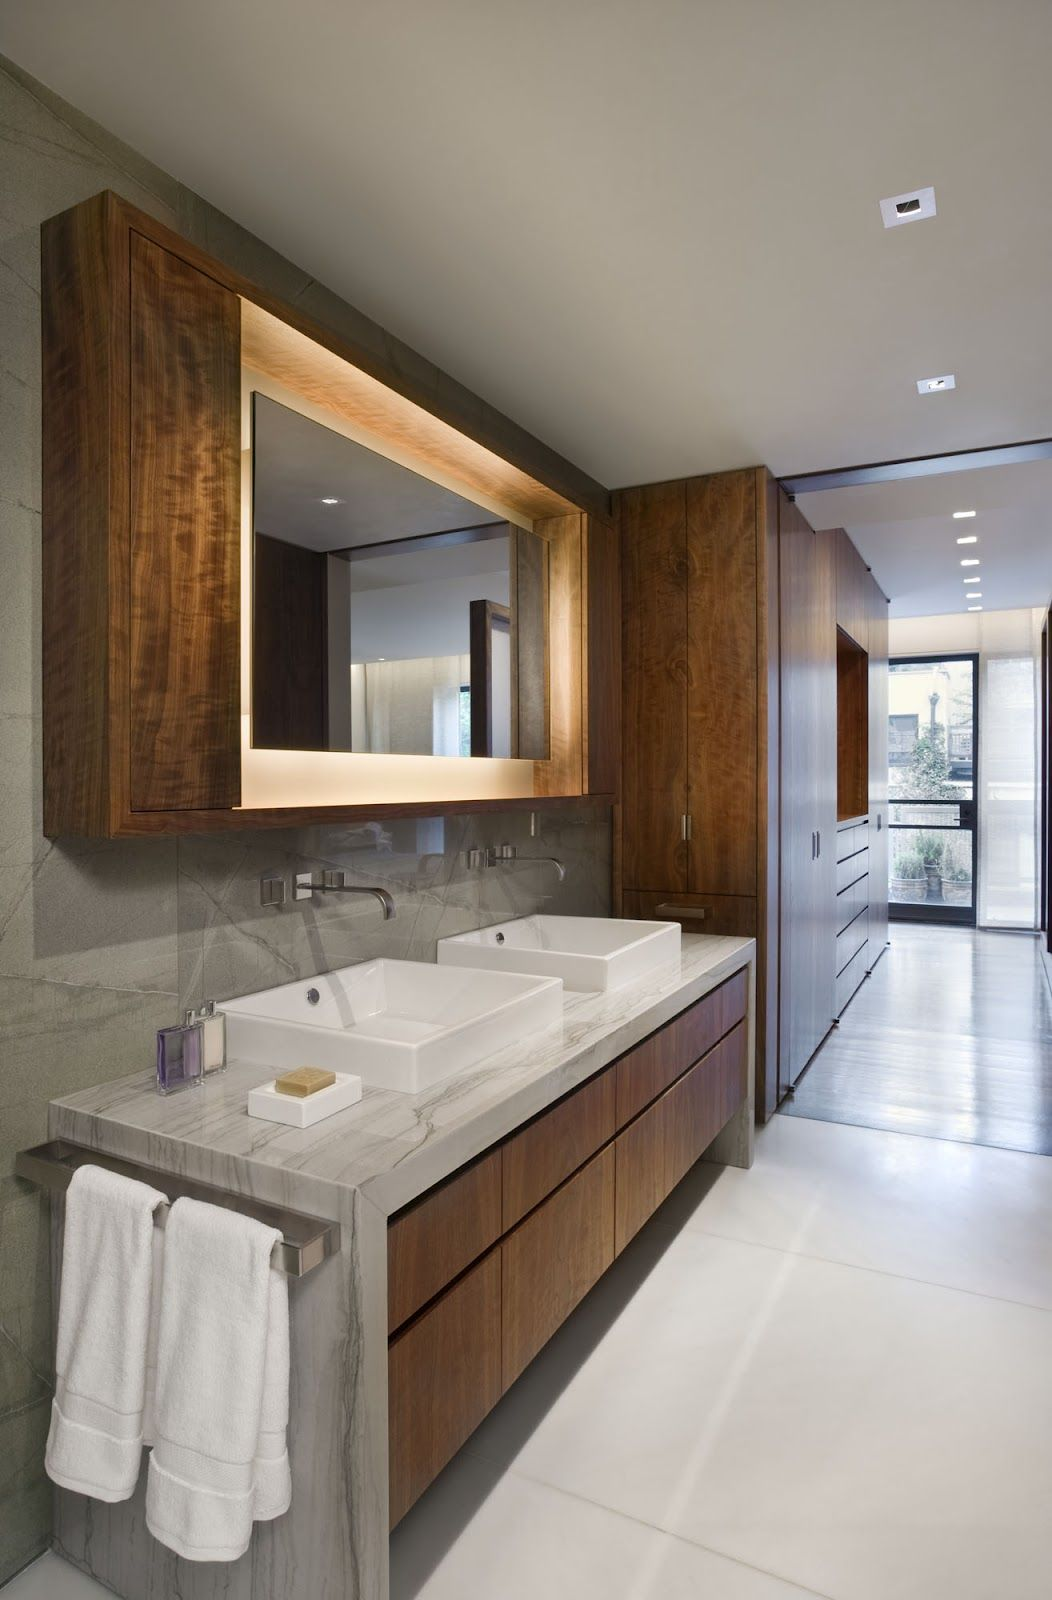 Inspiraciones dise o arquitectura y decoraci n ba os for Arquitectura banos modernos